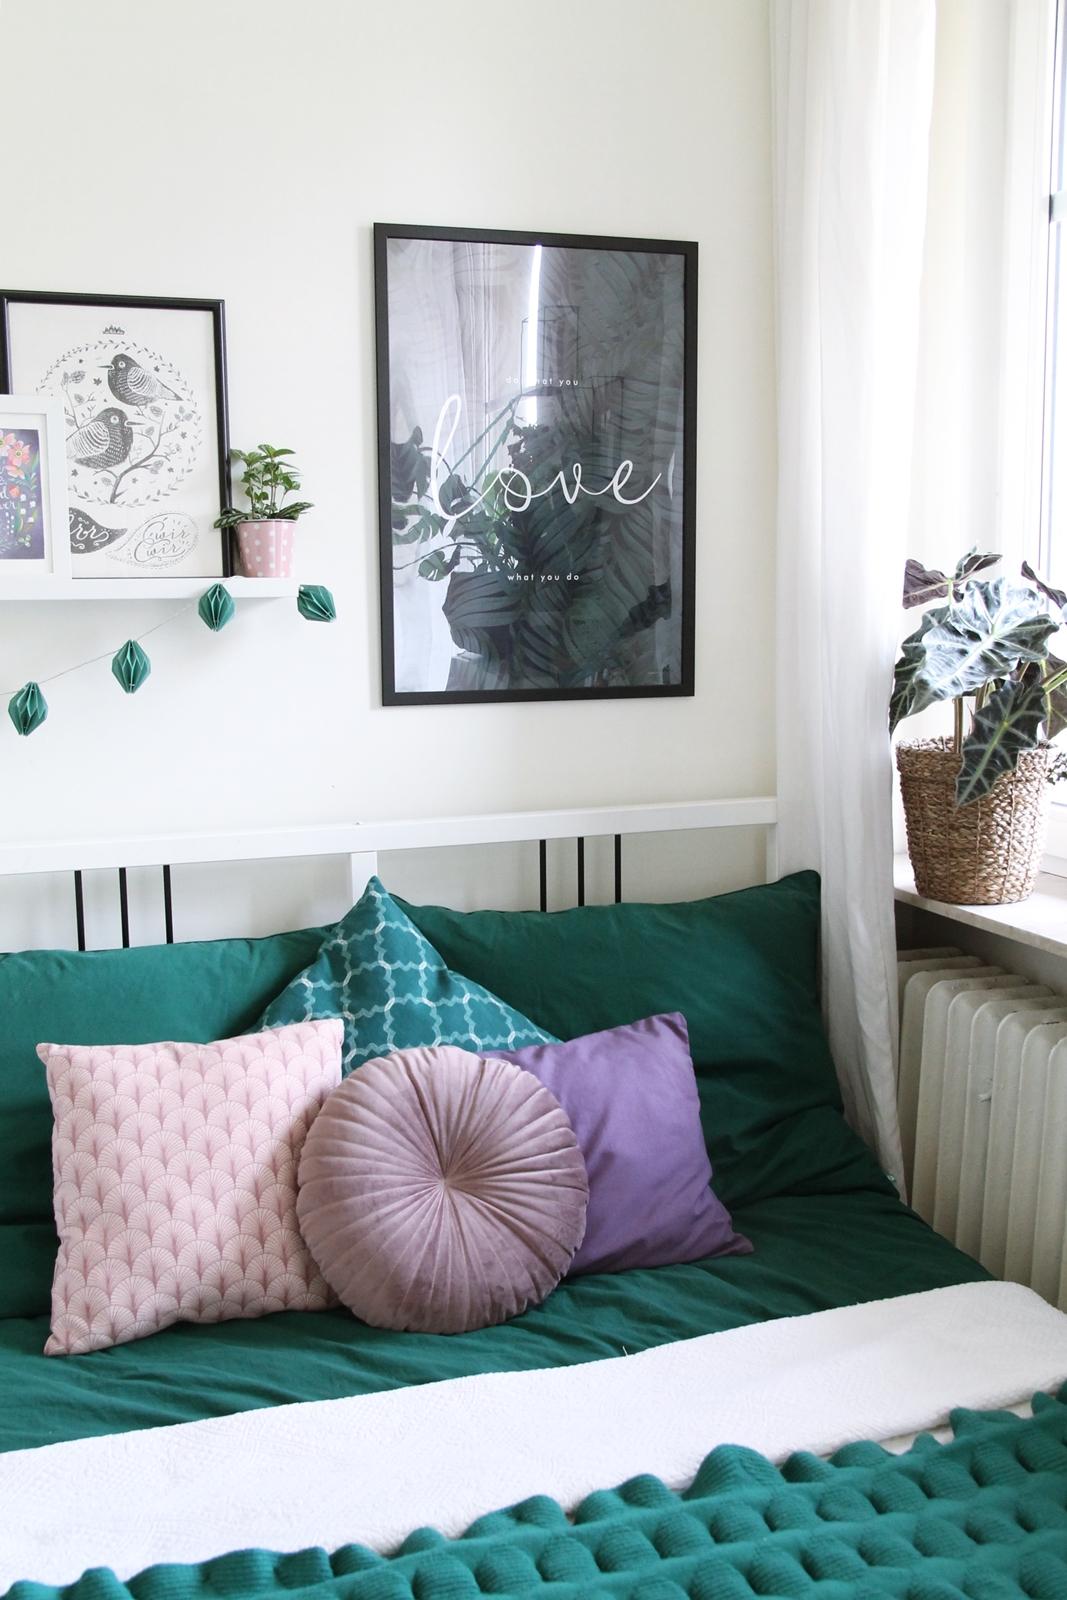 Green bedlinen